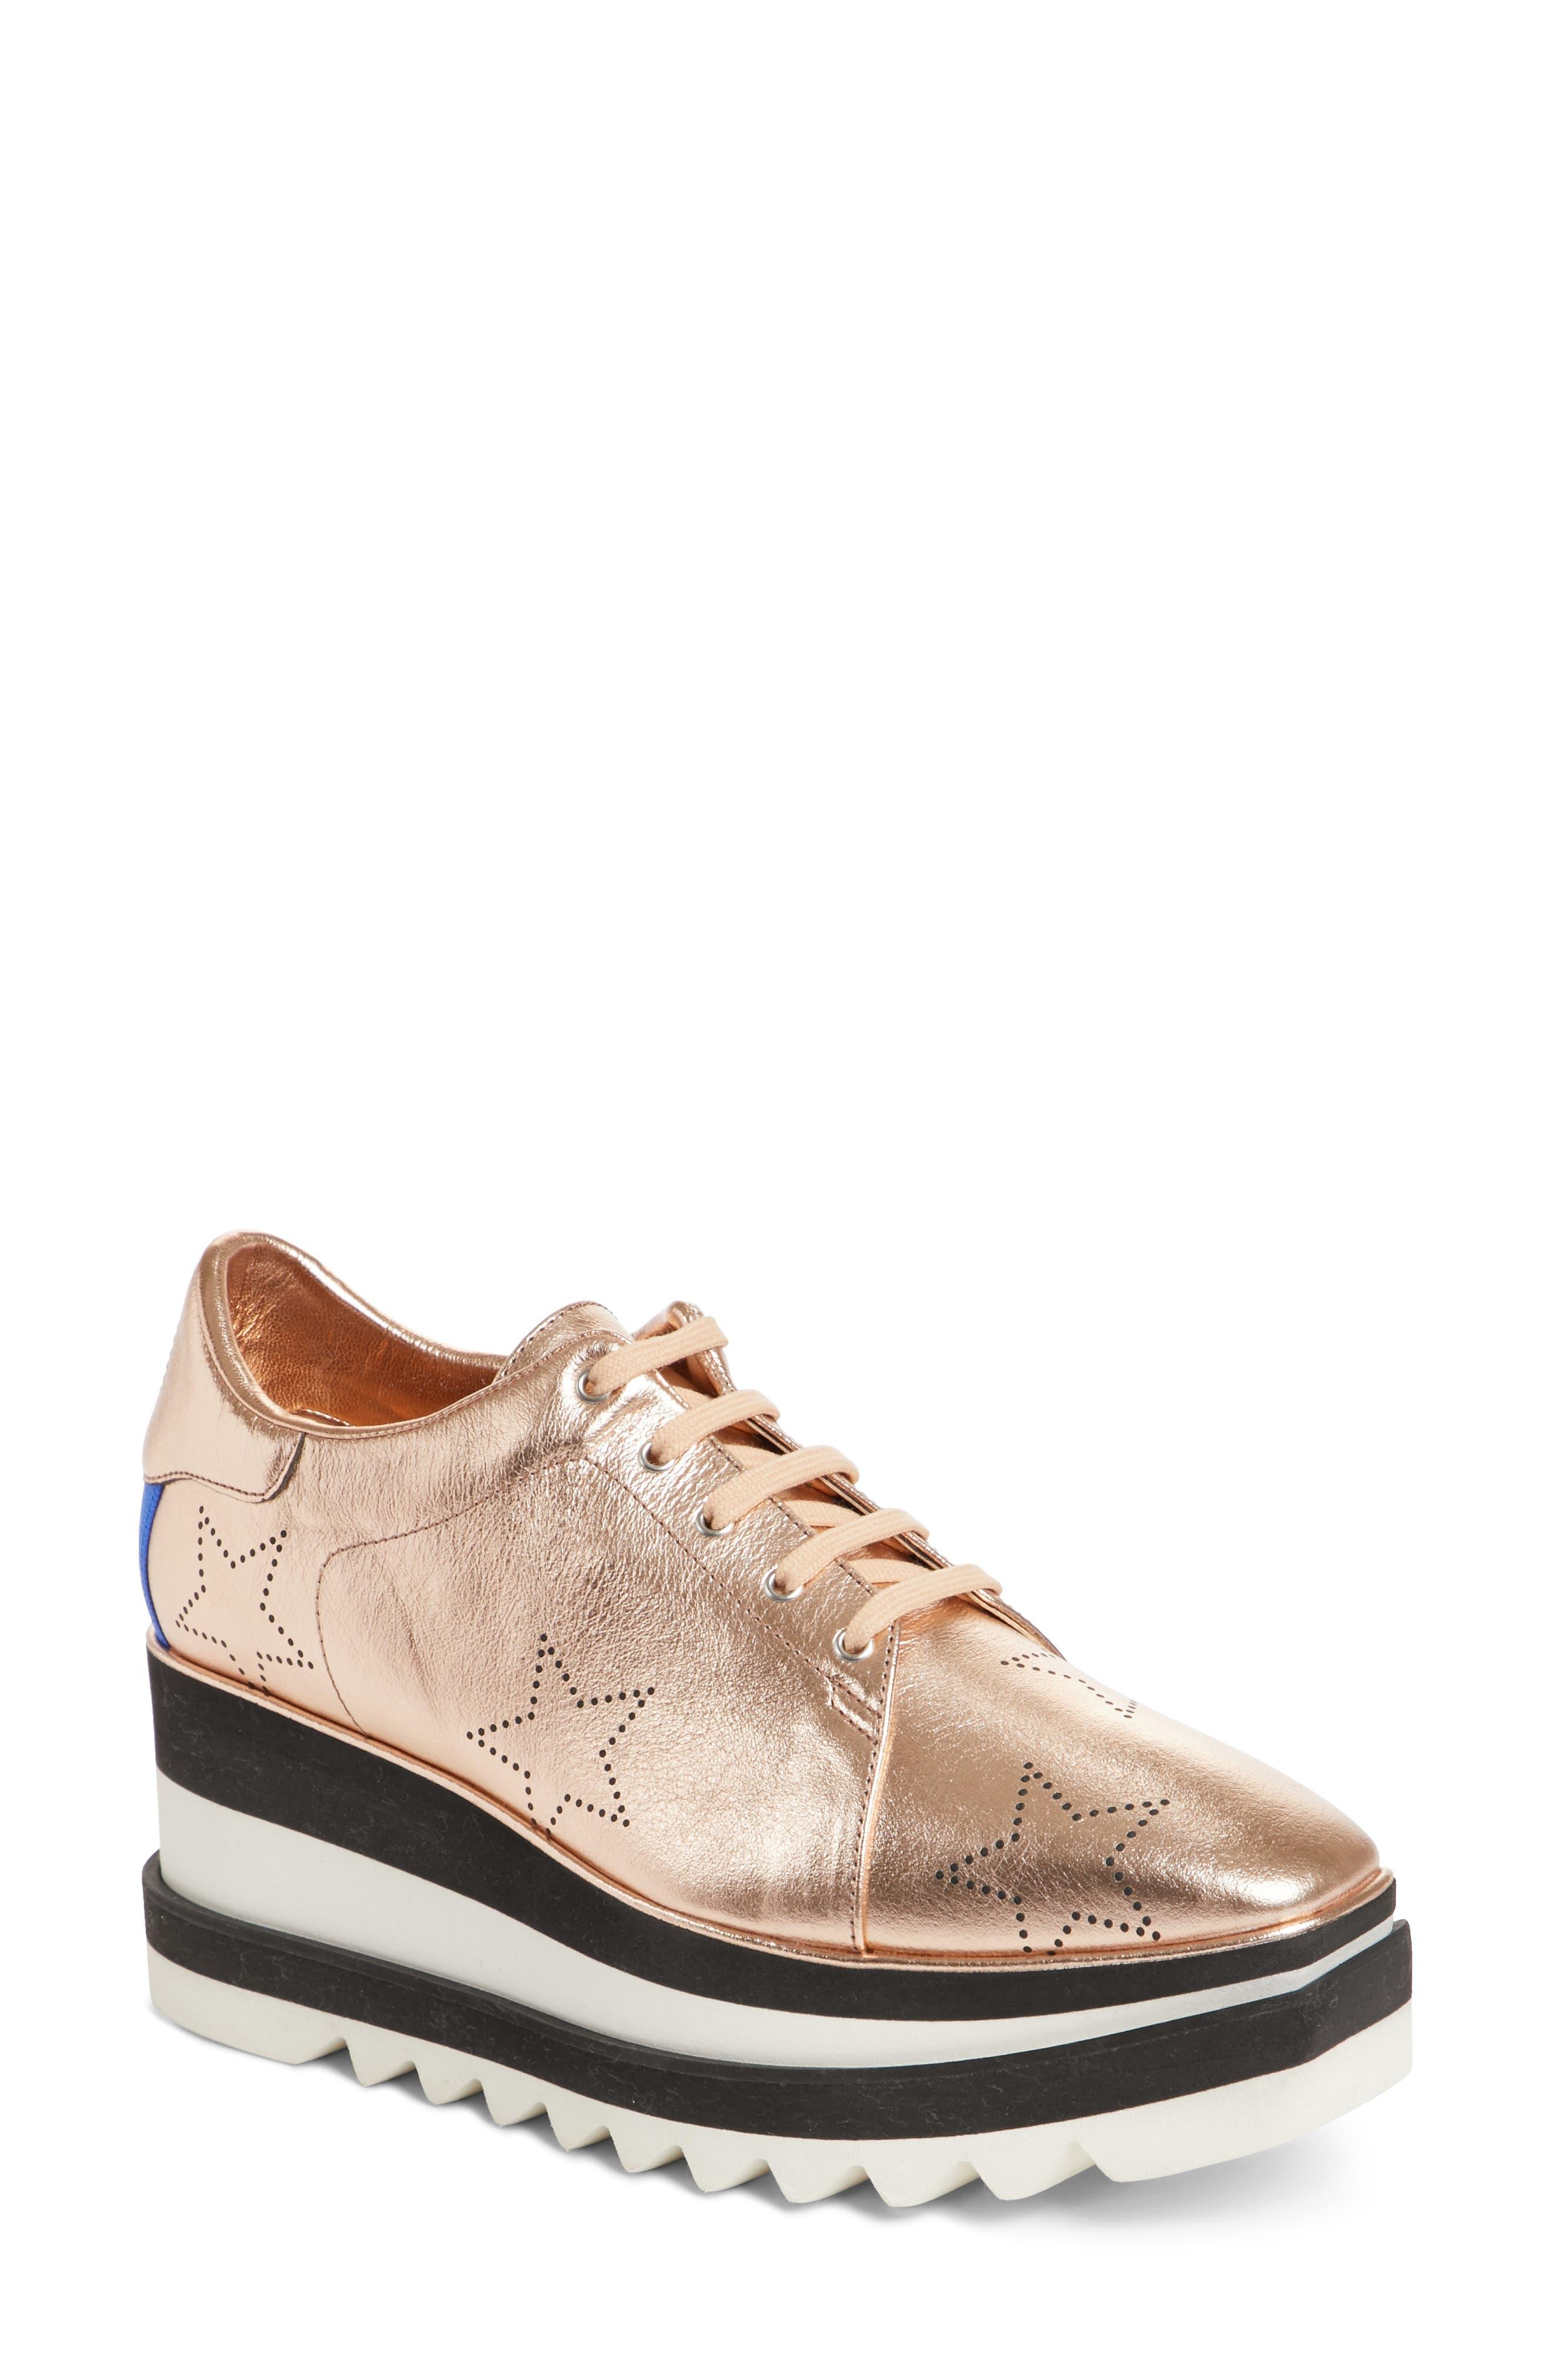 Main Image - Stella McCartney Elyse Platform Sneaker (Women)